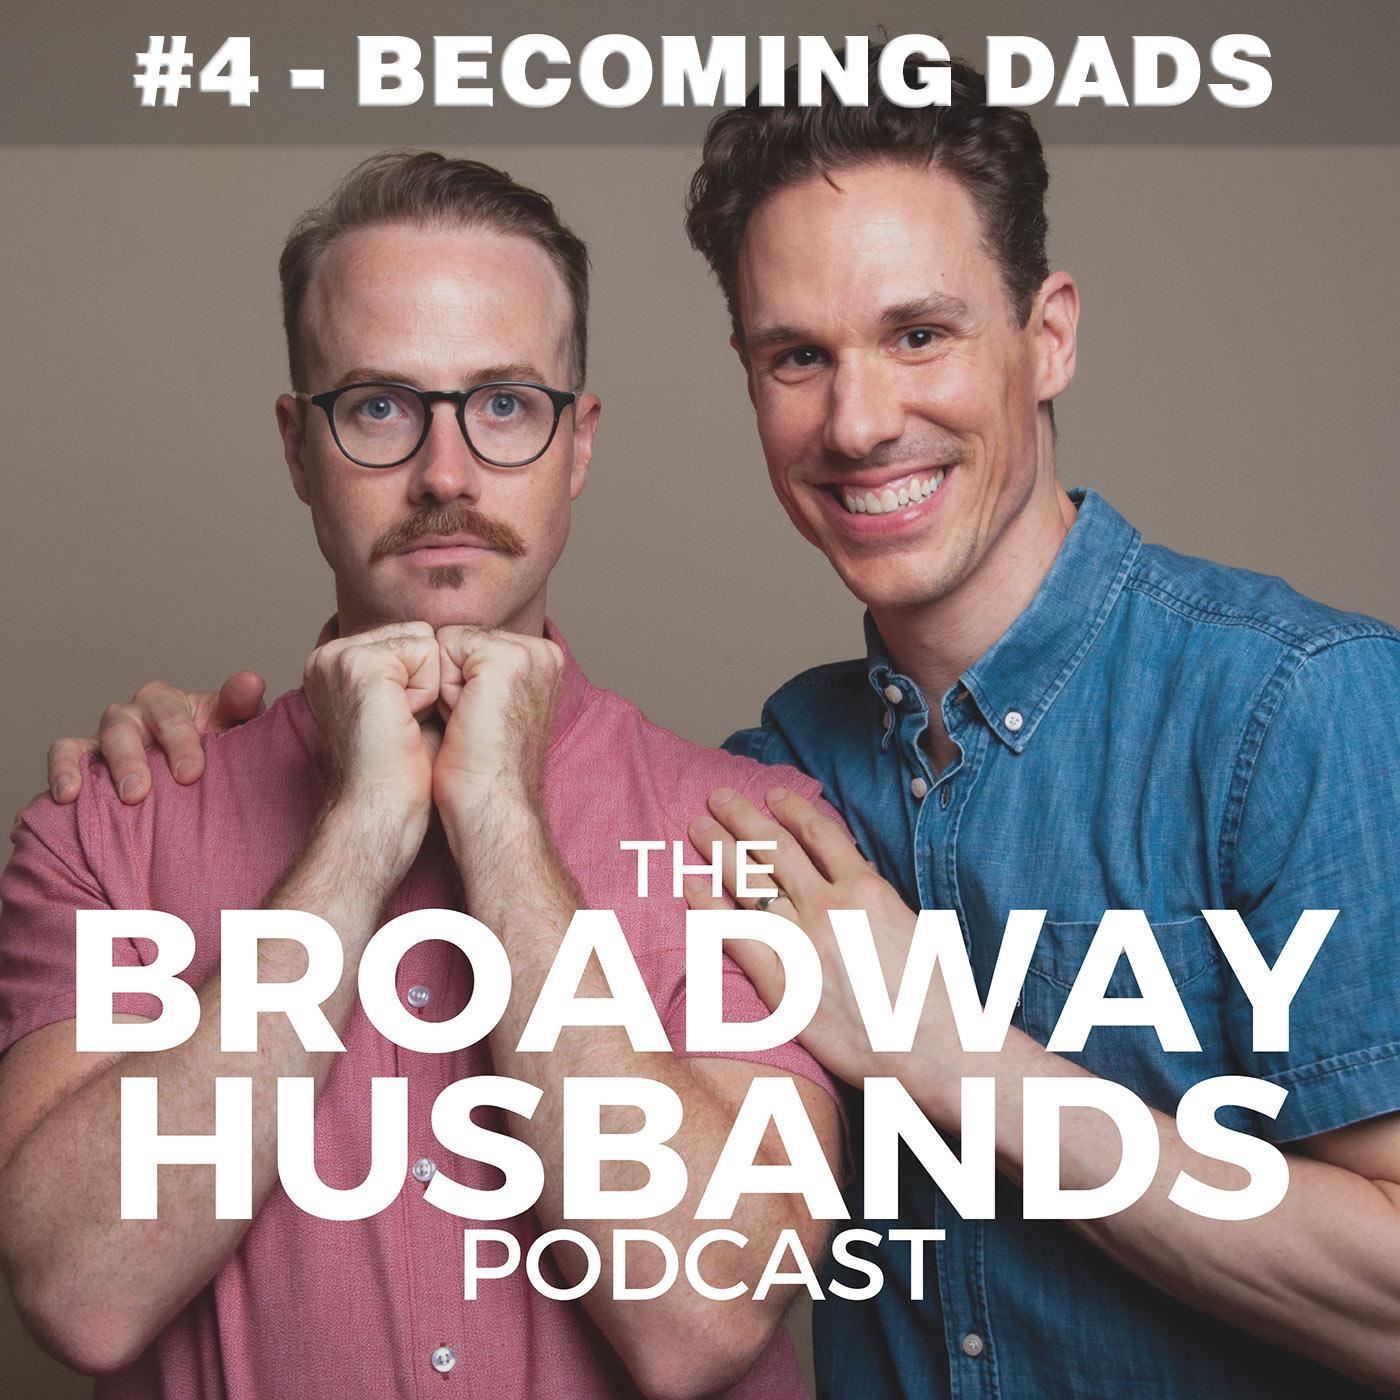 Broadway Husbands Episode 4 Becoming Dads